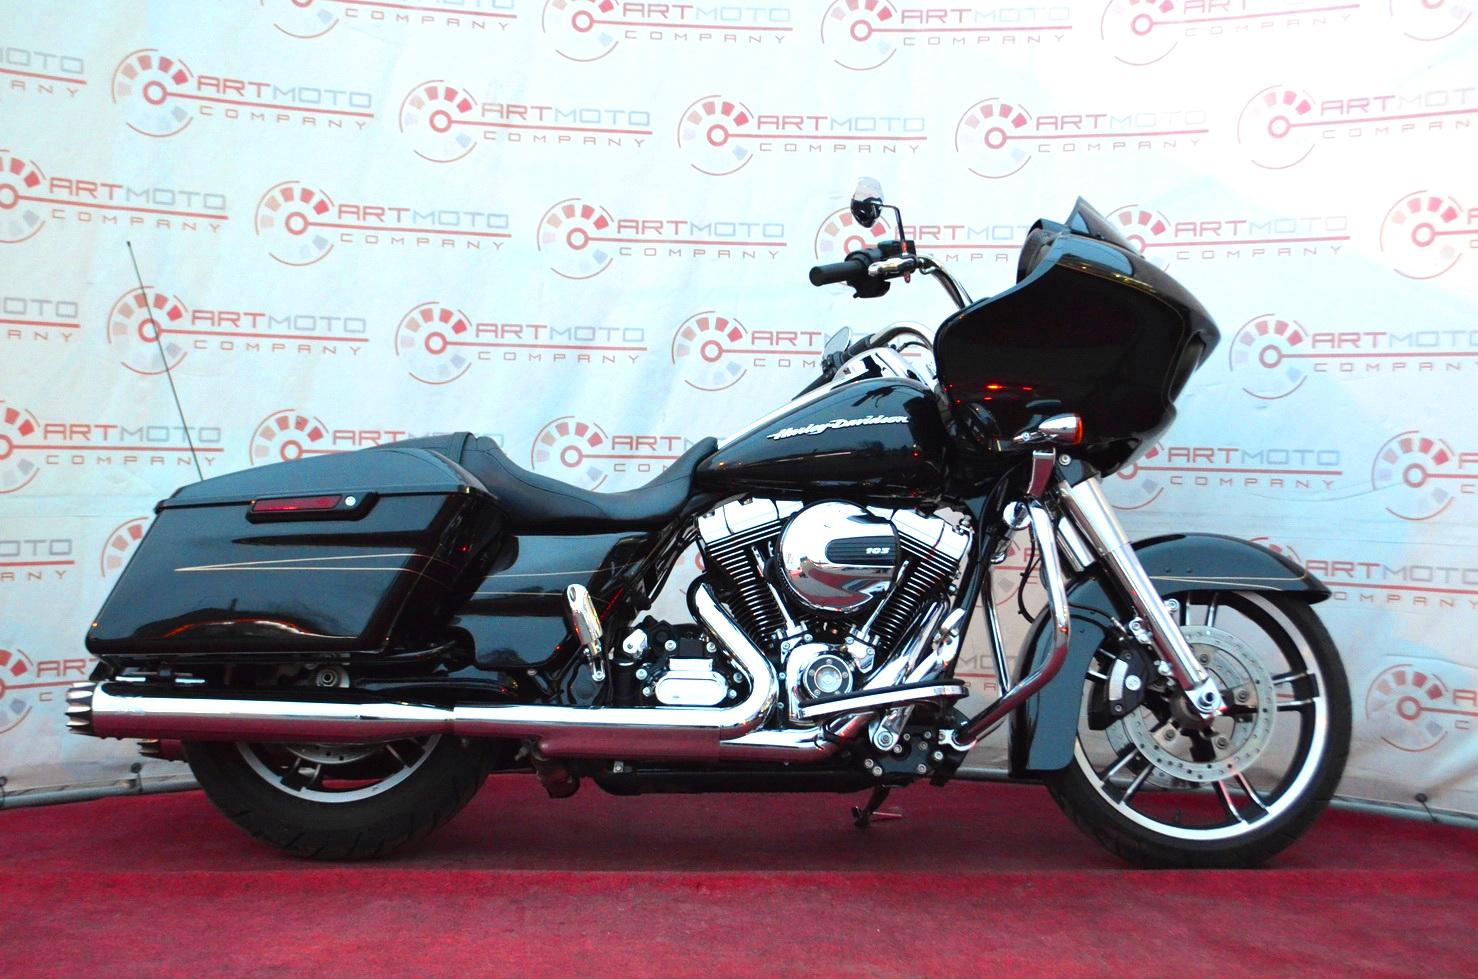 МОТОЦИКЛ HARLEY DAVIDSON FLTRXS ROAD GLIDE 2016 ― Артмото - купить квадроцикл в украине и харькове, мотоцикл, снегоход, скутер, мопед, электромобиль